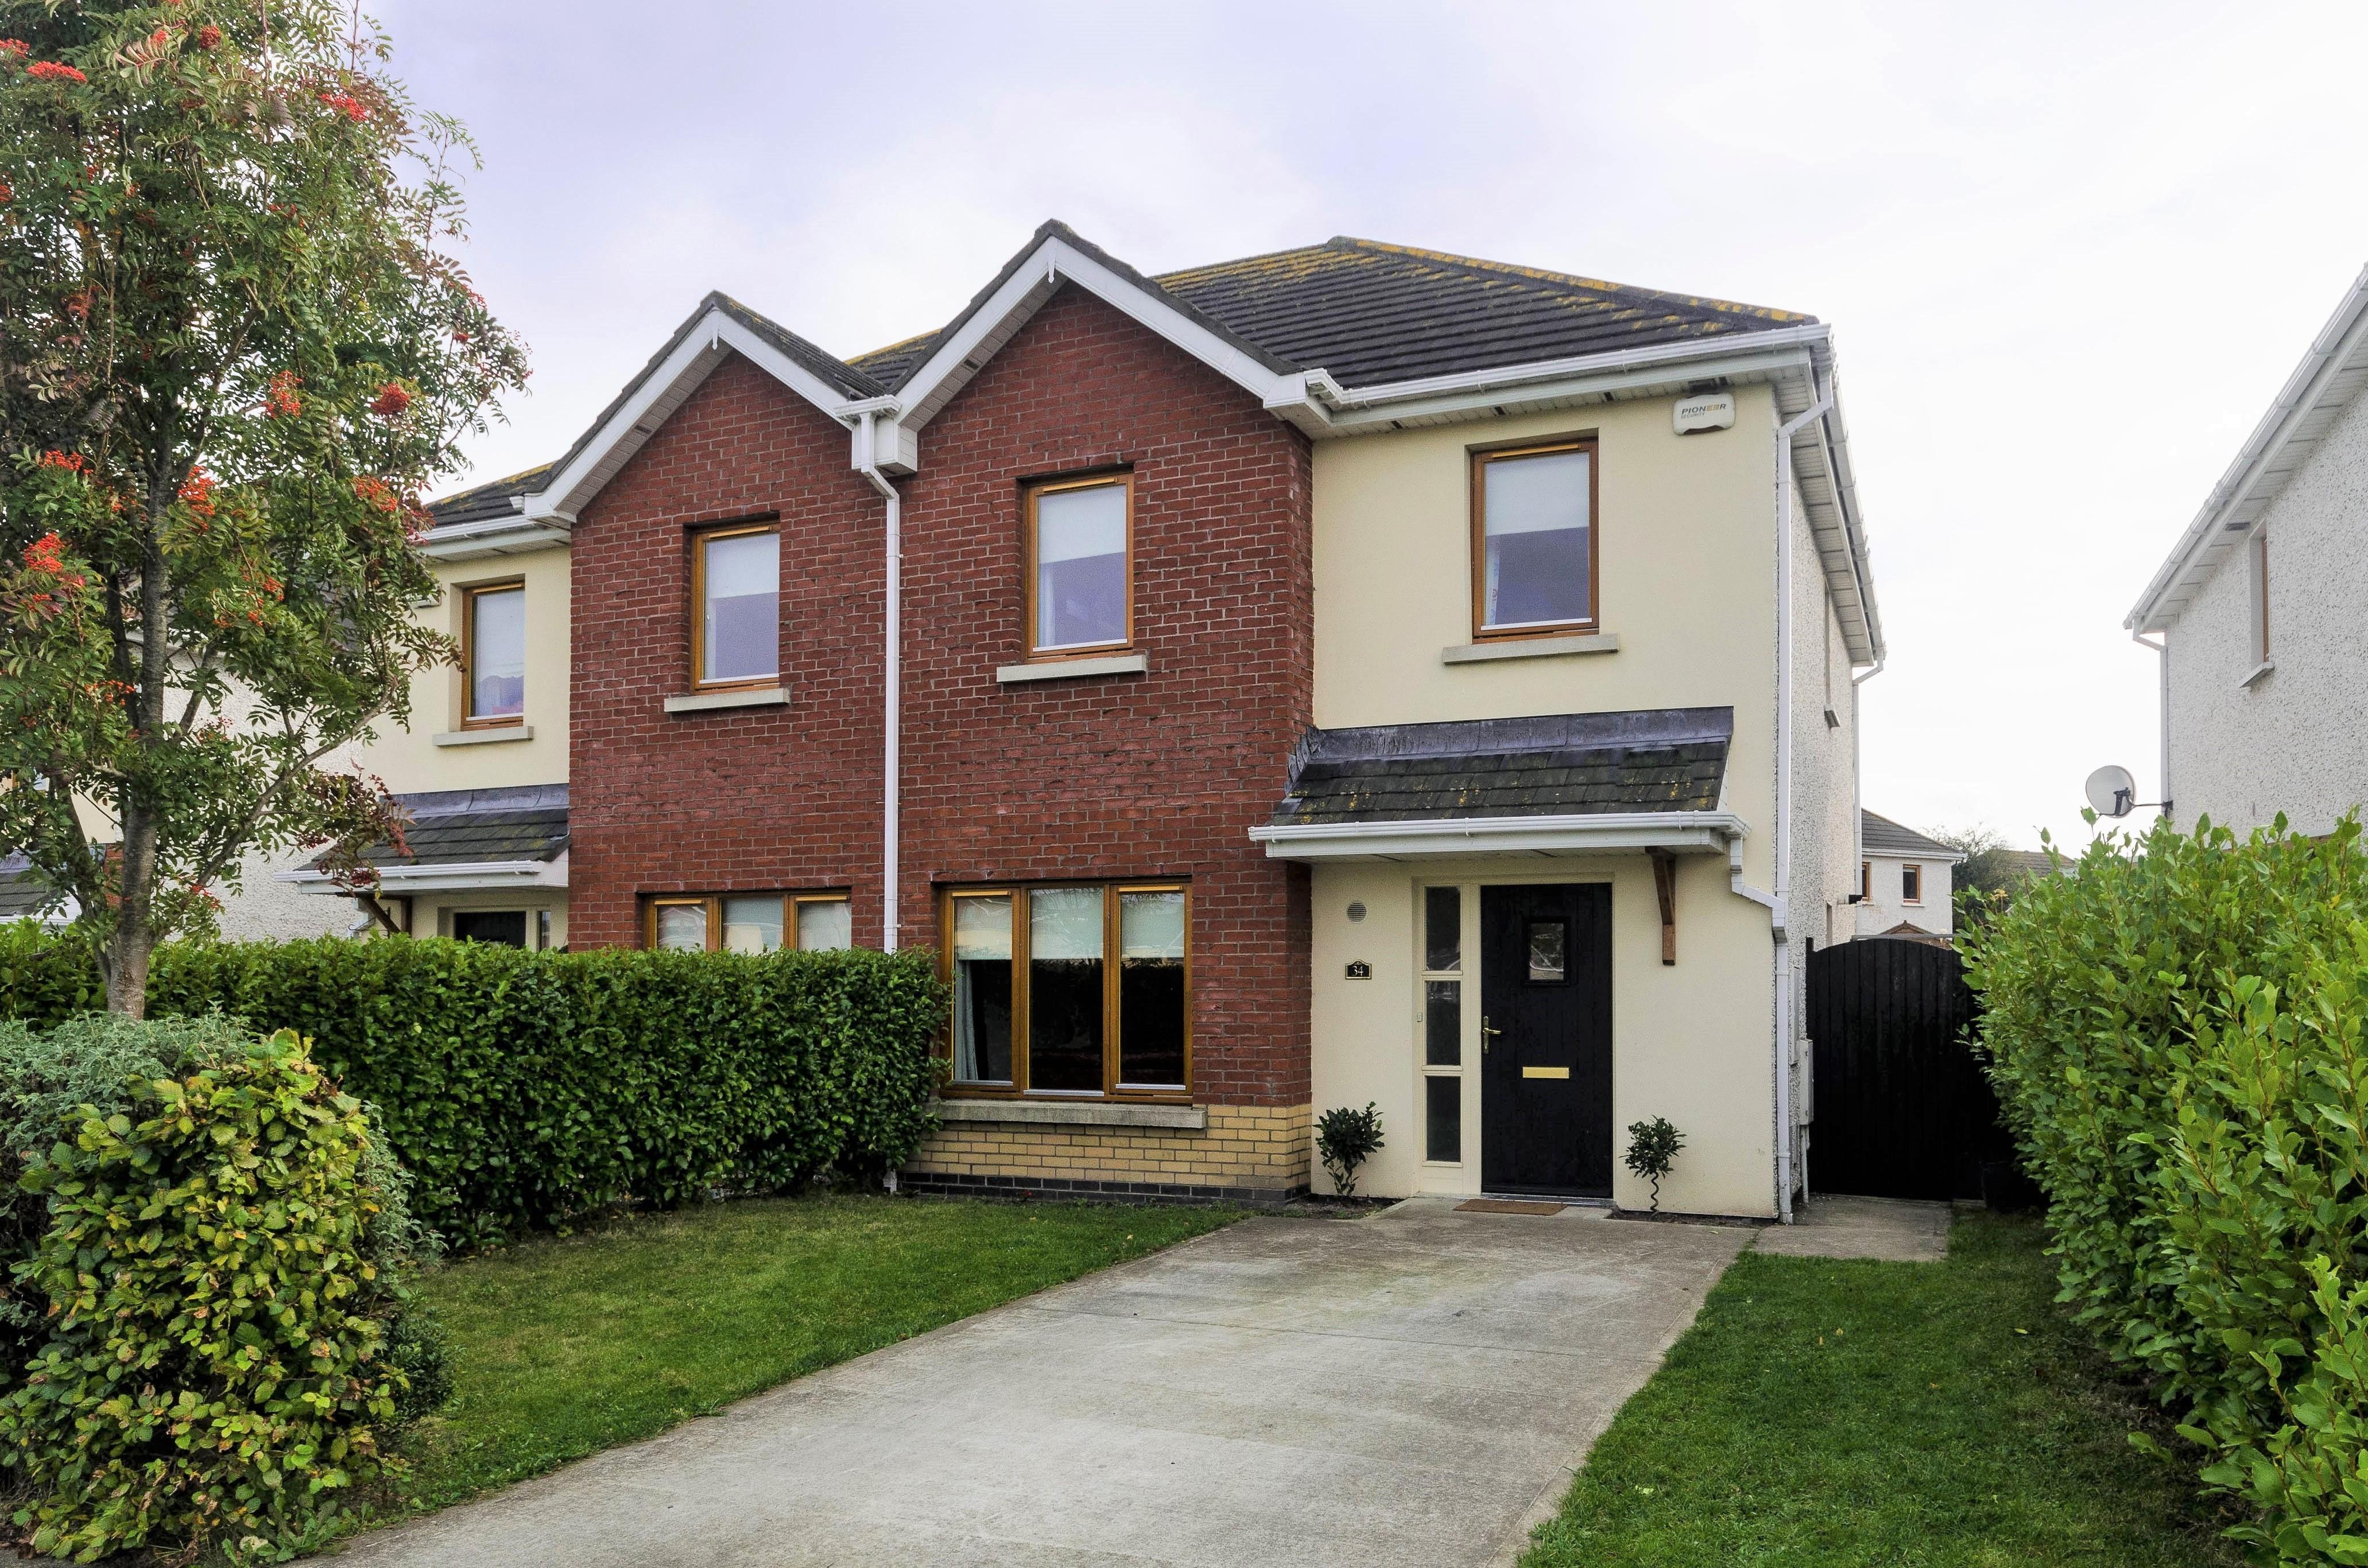 34 Holywell Crescent, Kilcoole, Co Wicklow